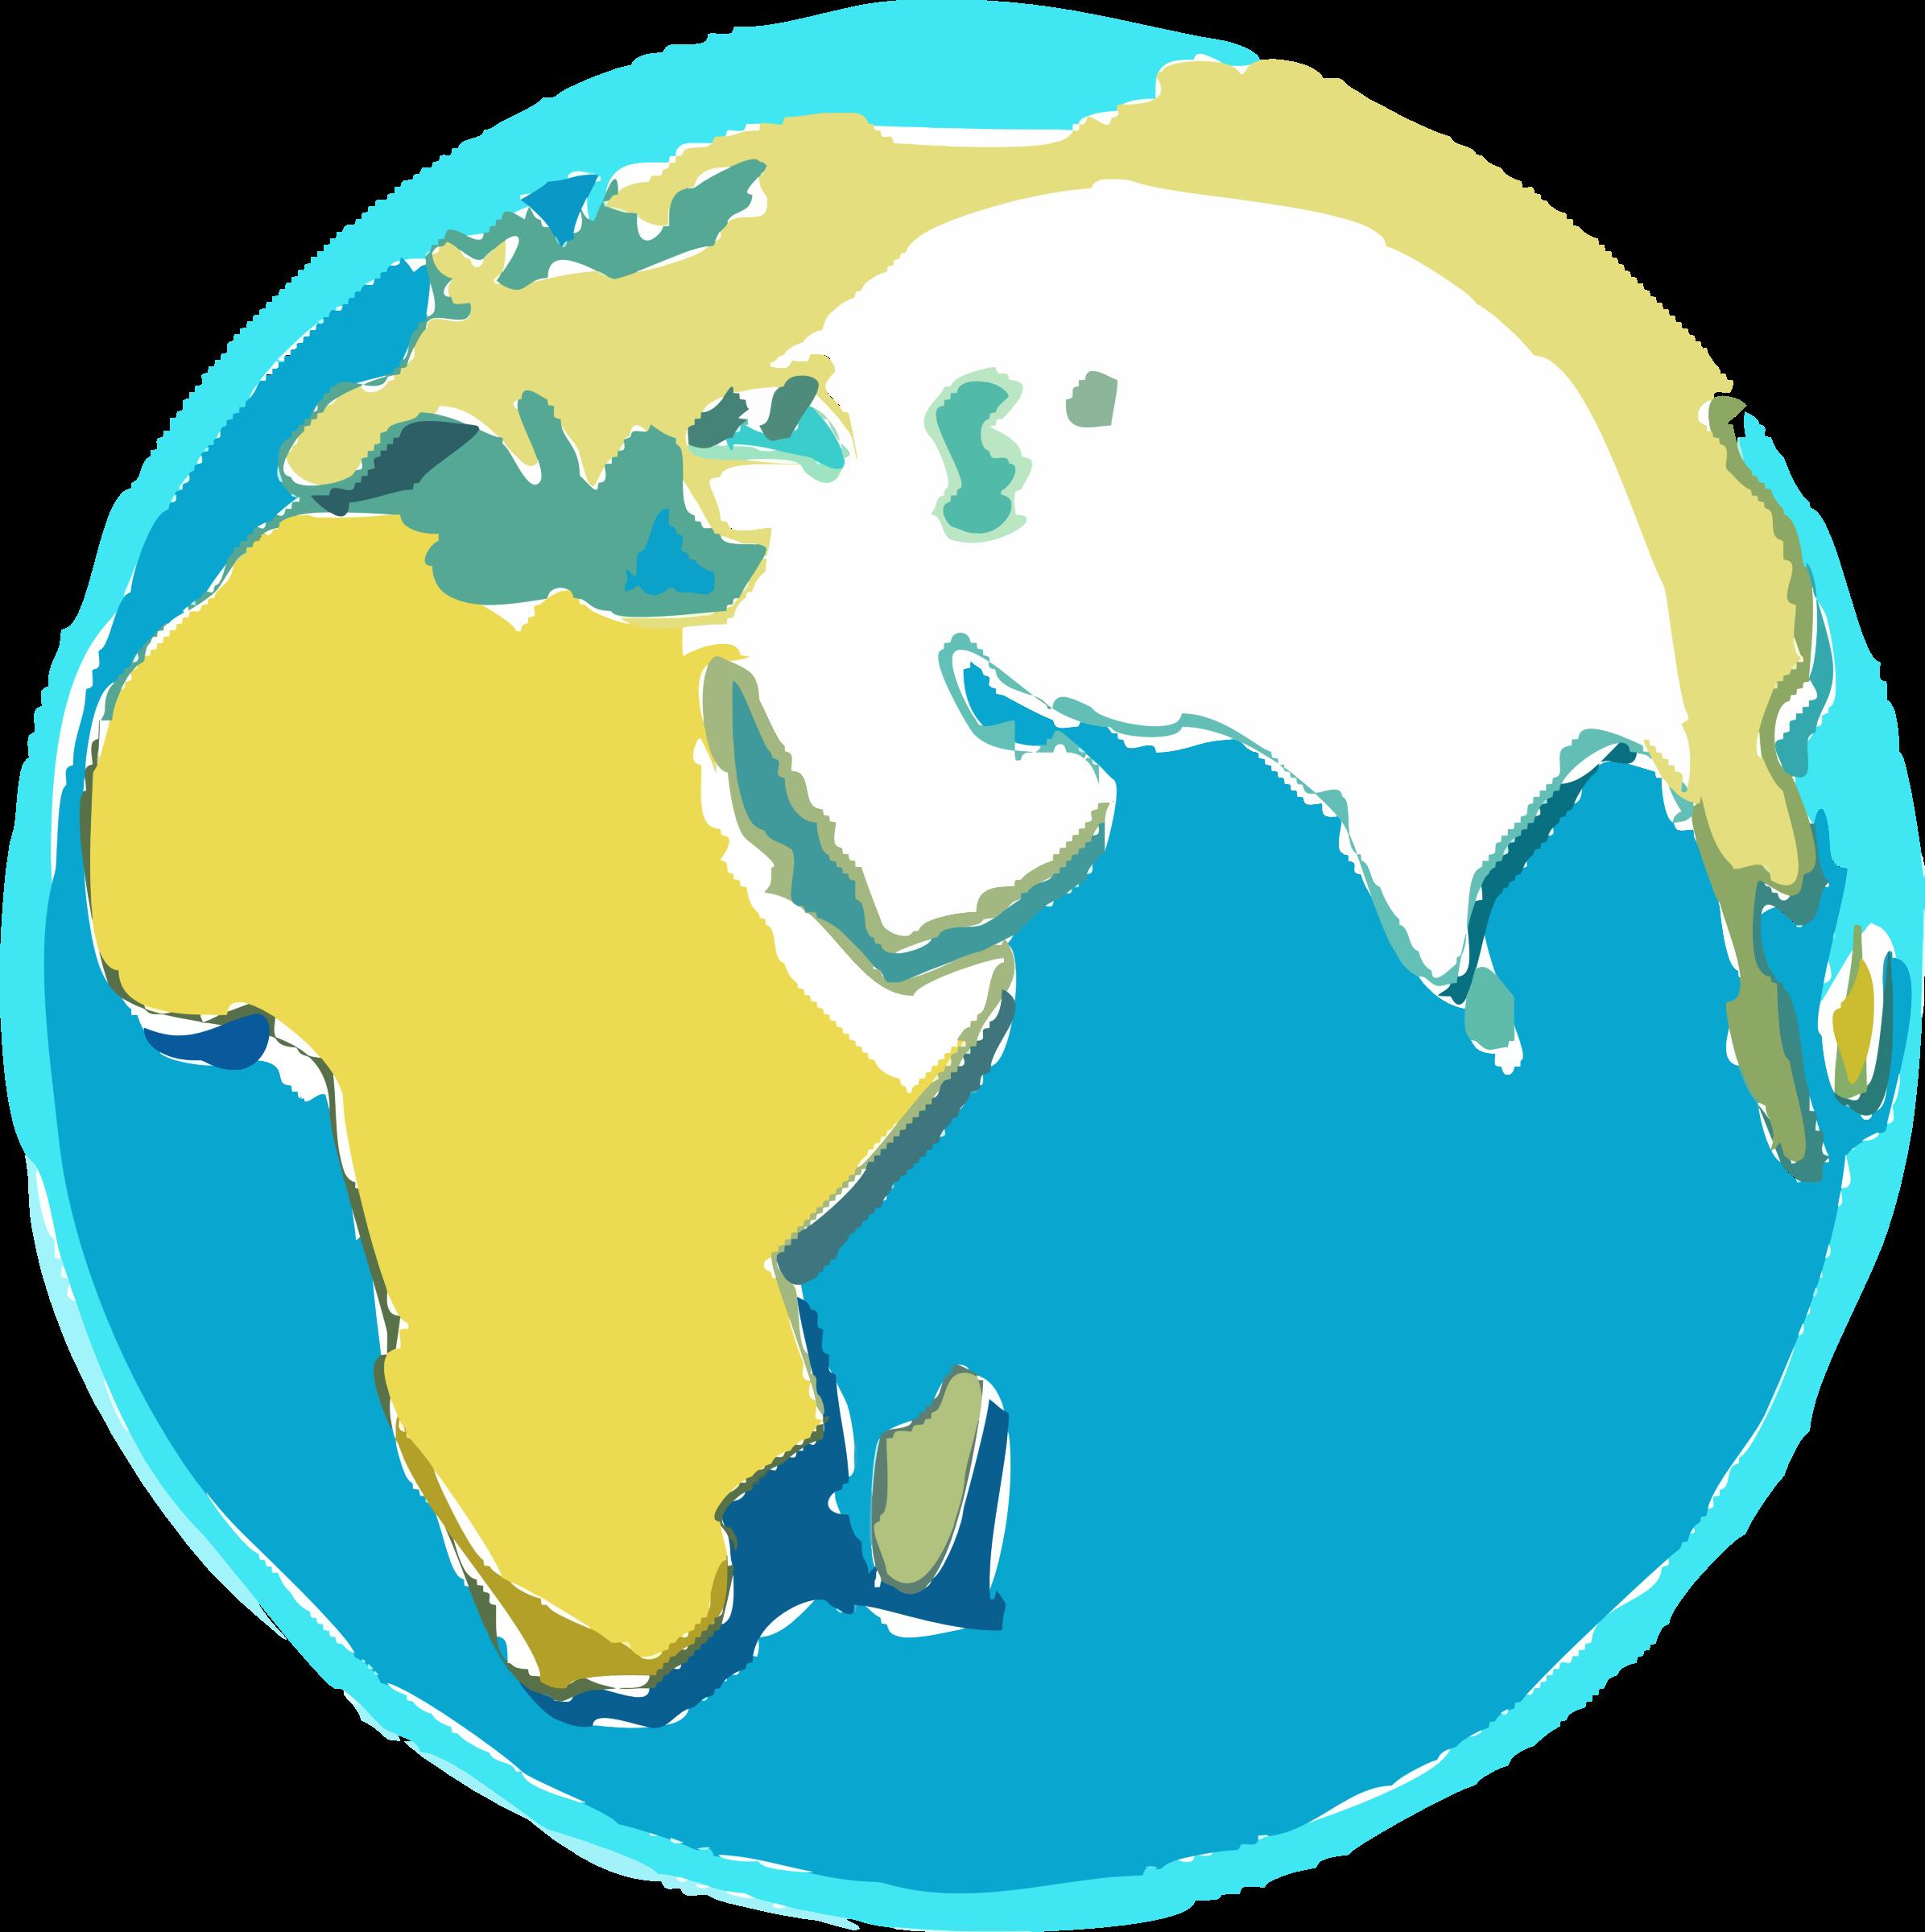 Clipart globe sketches. Earth sketch big image